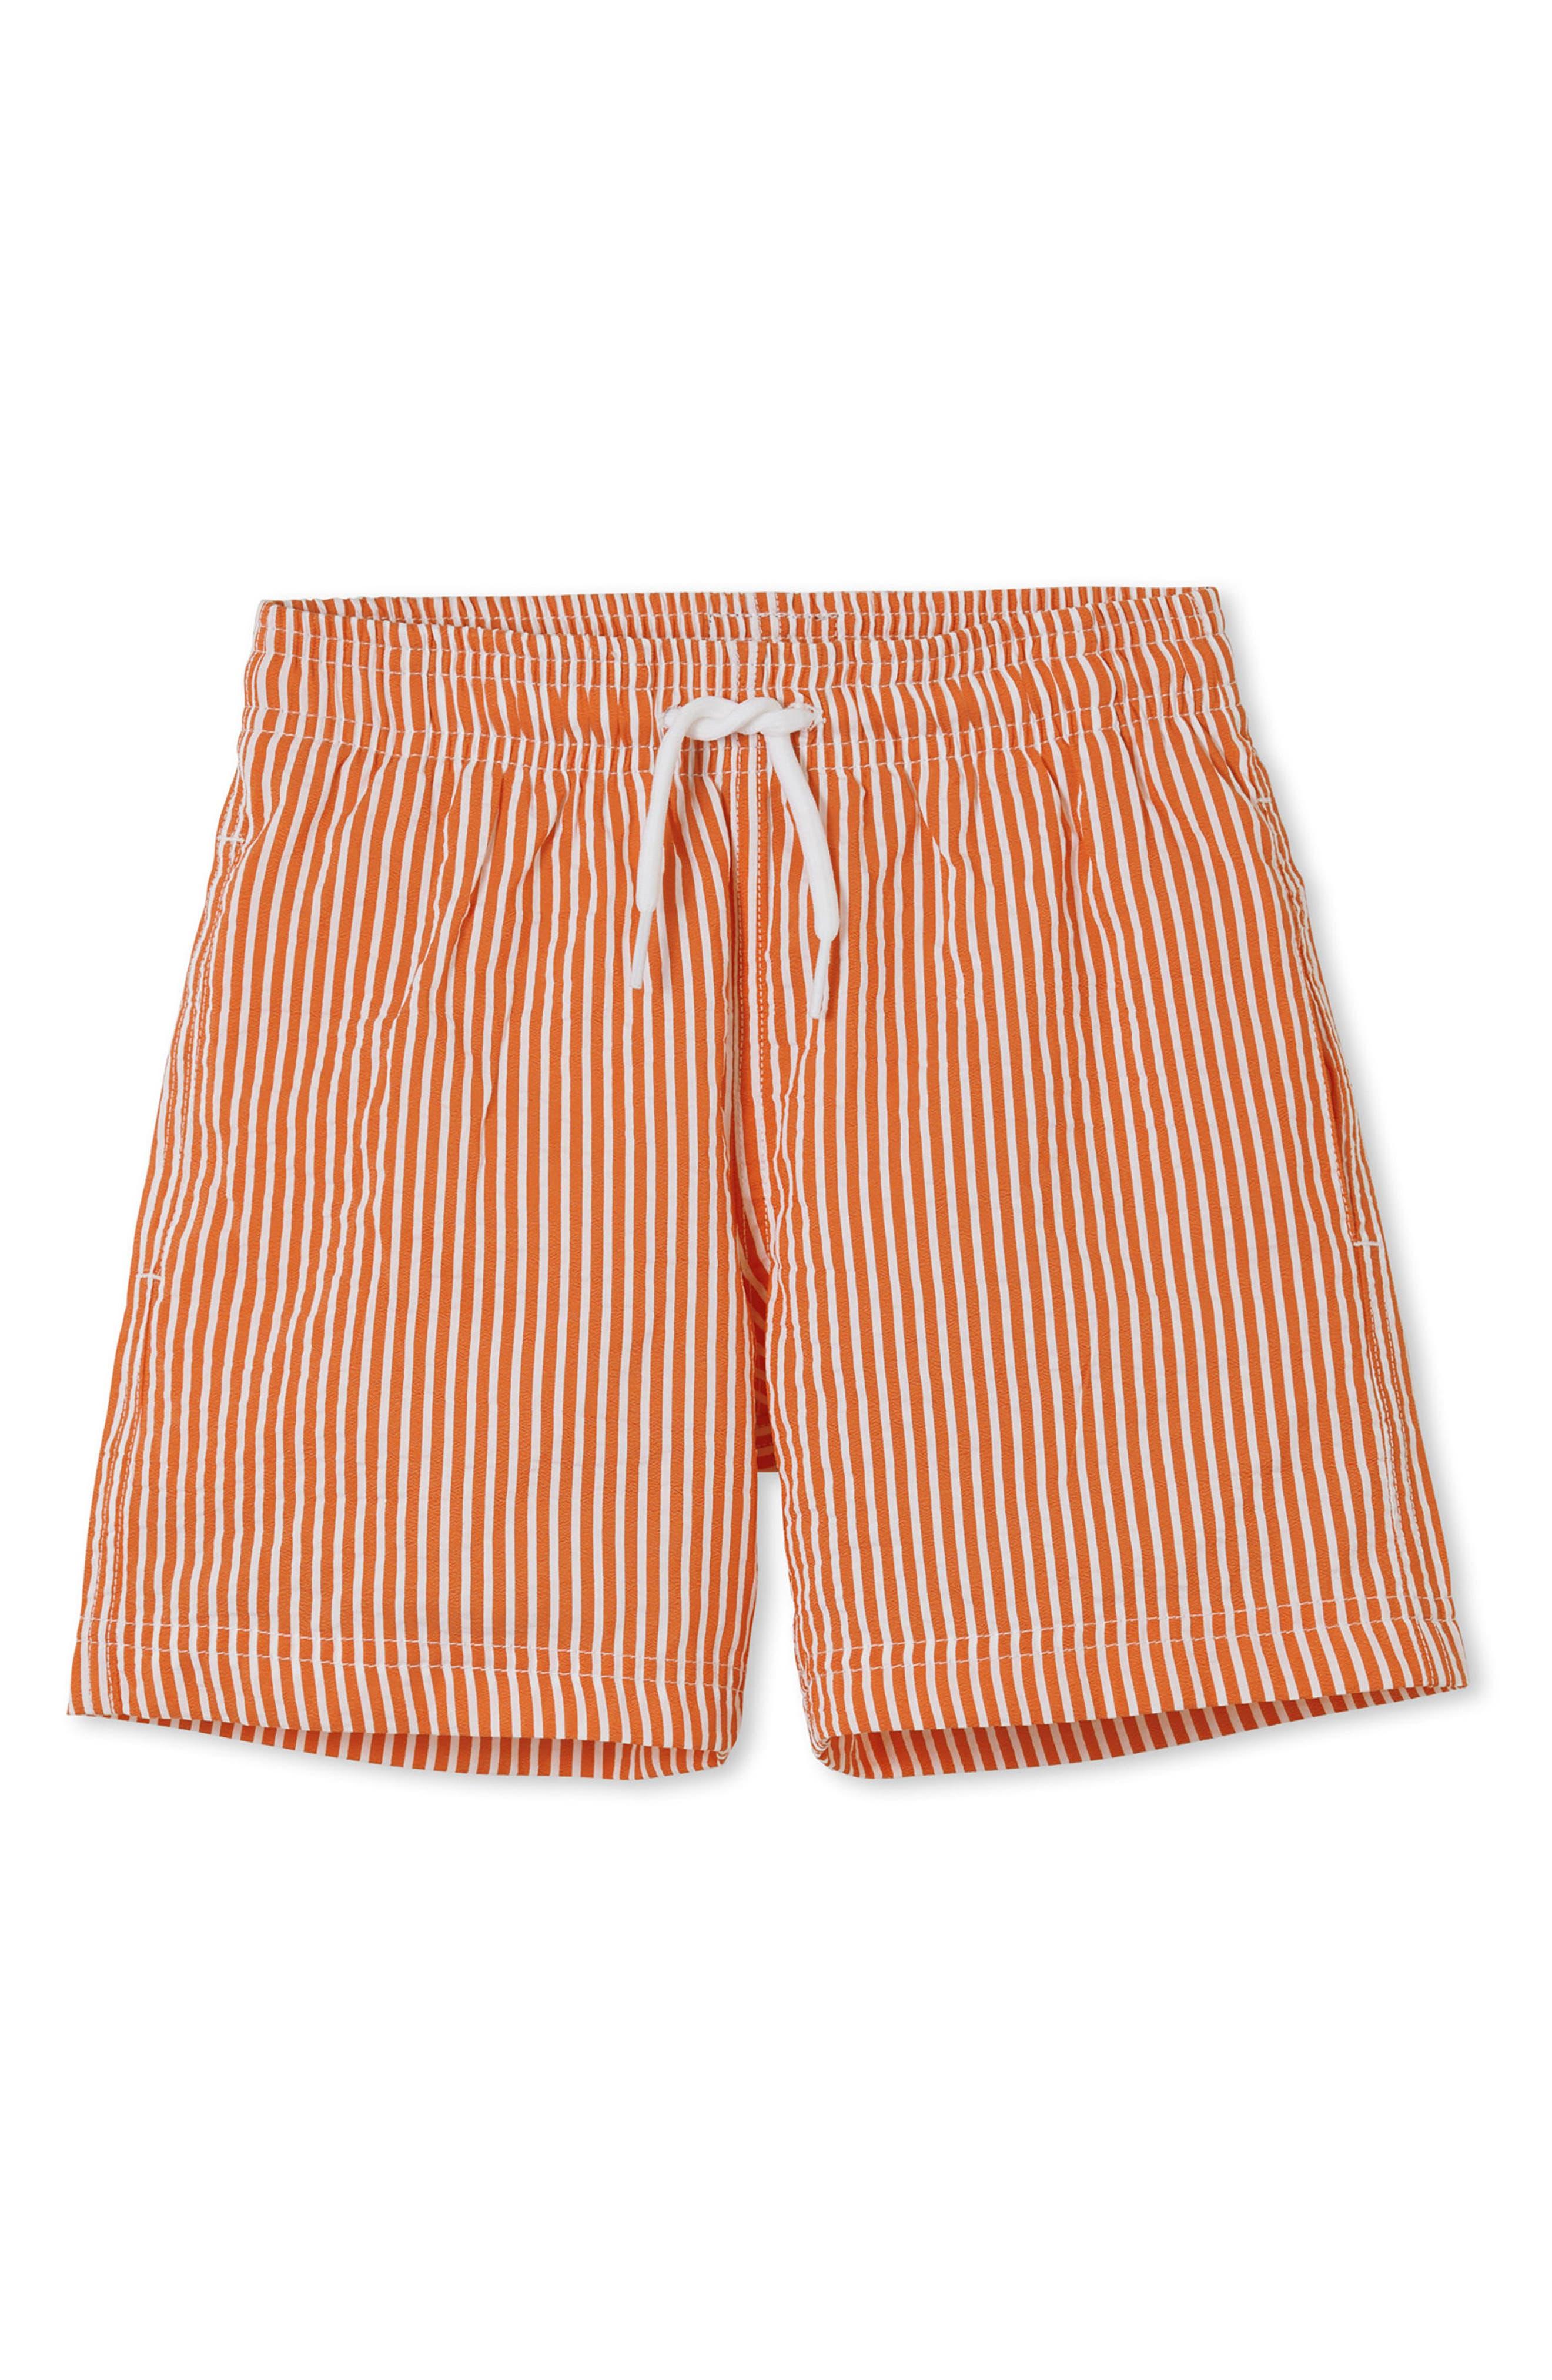 Orange Stripe Swim Trunks,                         Main,                         color, Orange